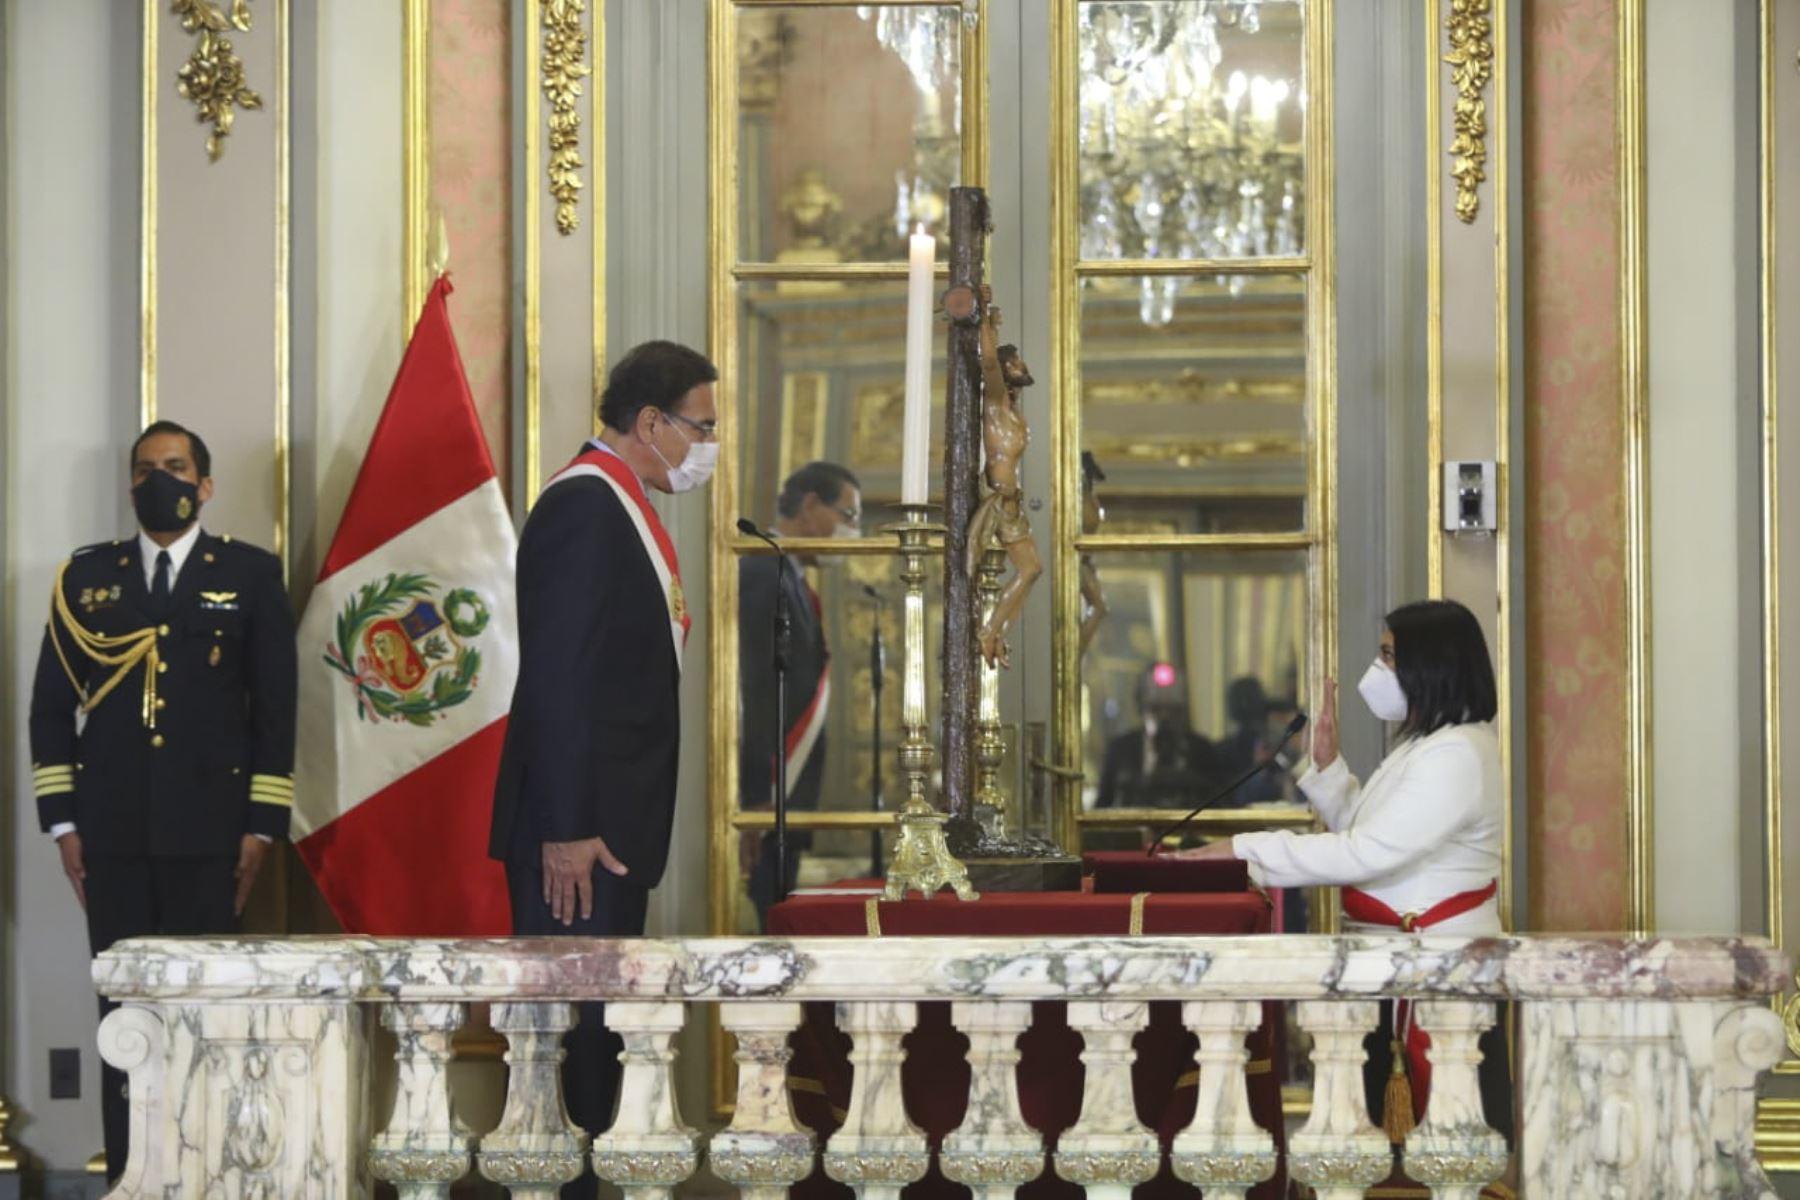 El presidente de la República, Martín Vizcarra, toma juramento a Ana Neyra Zegarra como ministra de Justicia .Foto: ANDINA/ Prensa Presidencia